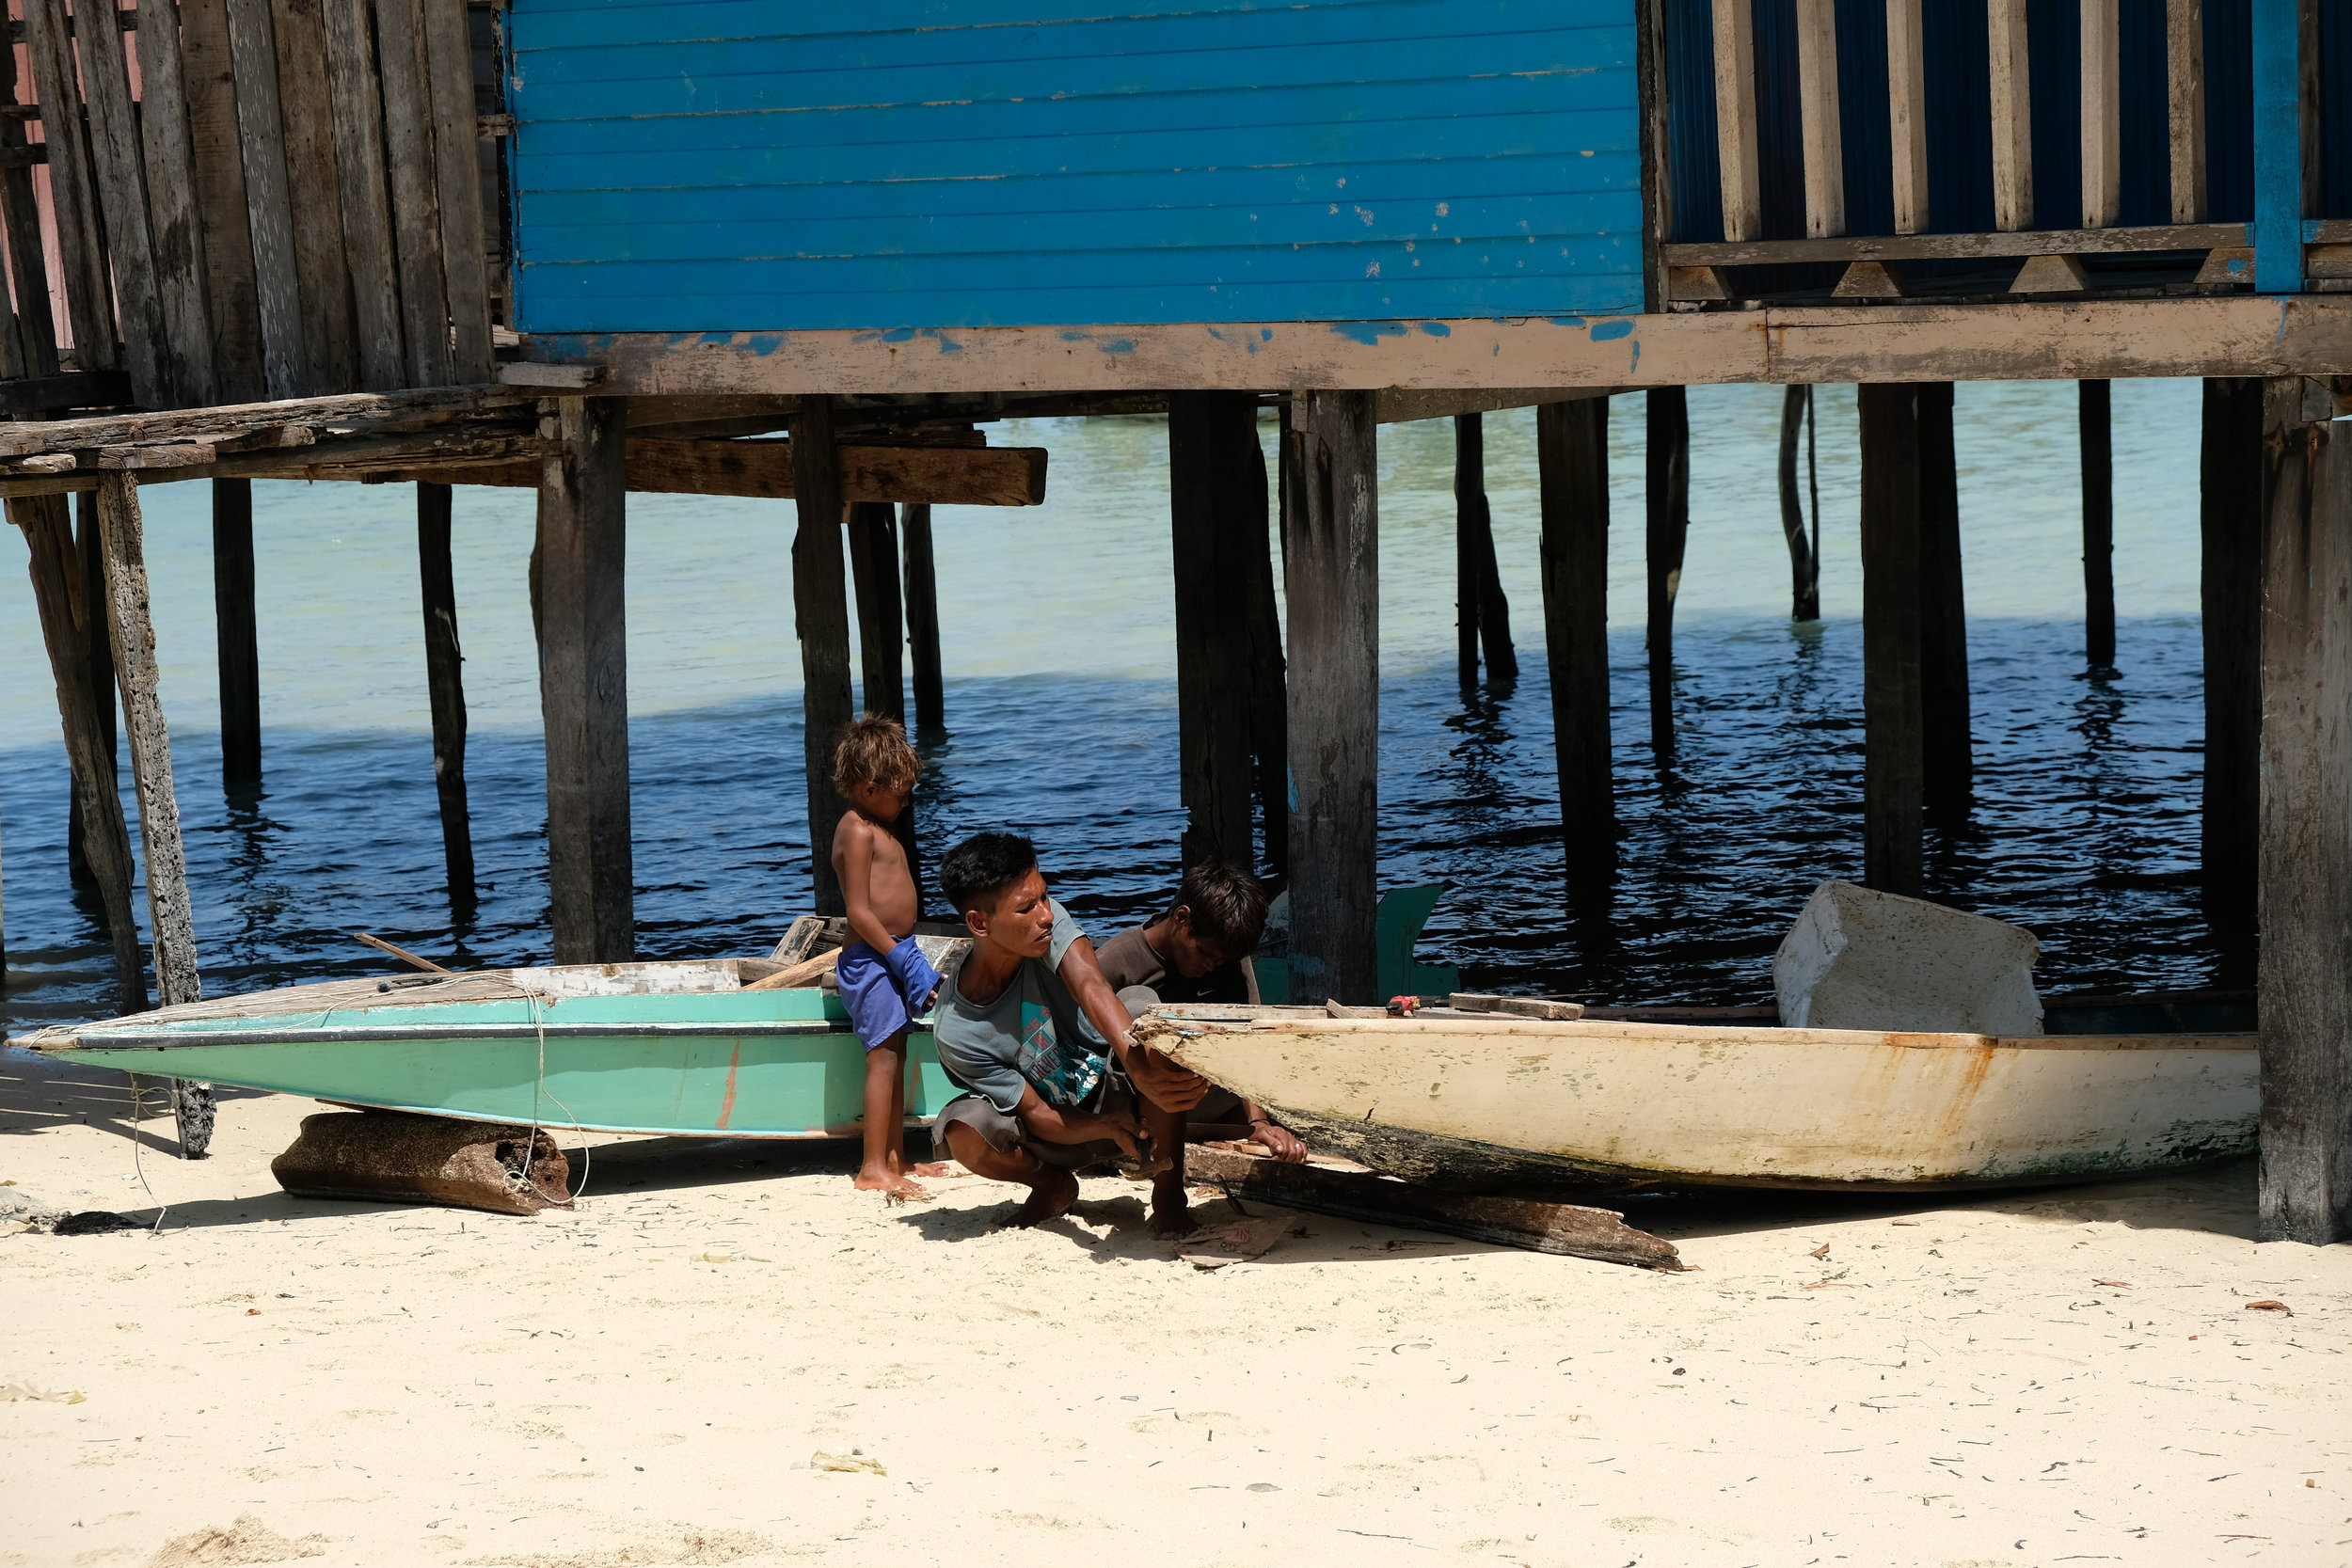 Fixing the boat - Bum Bum Island